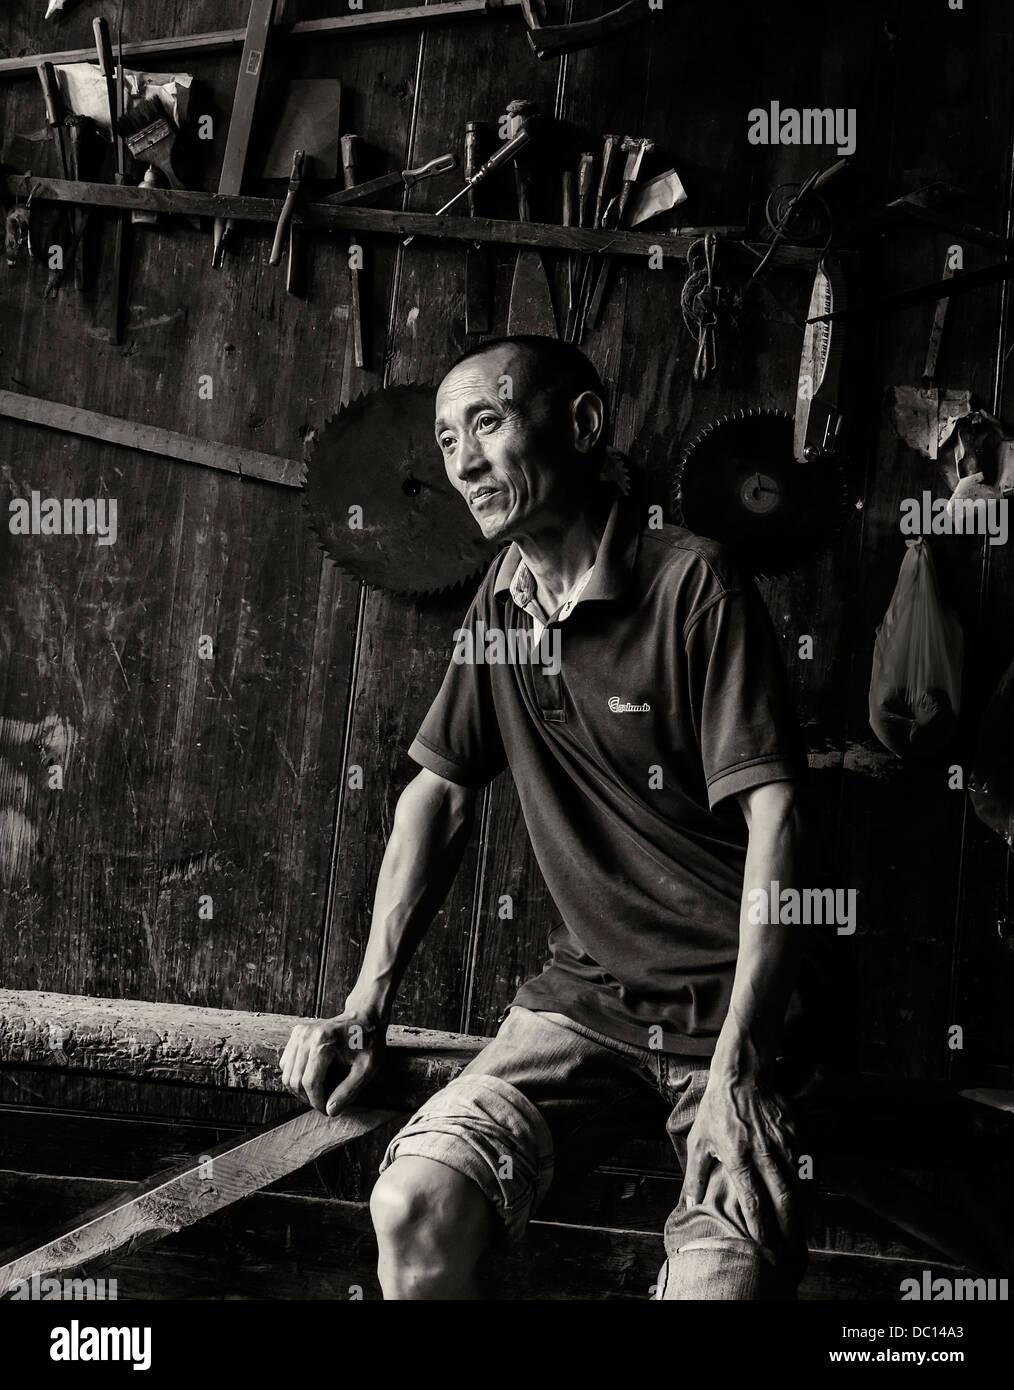 miao wood artisan in the  western Hunan Province,China. - Stock Image